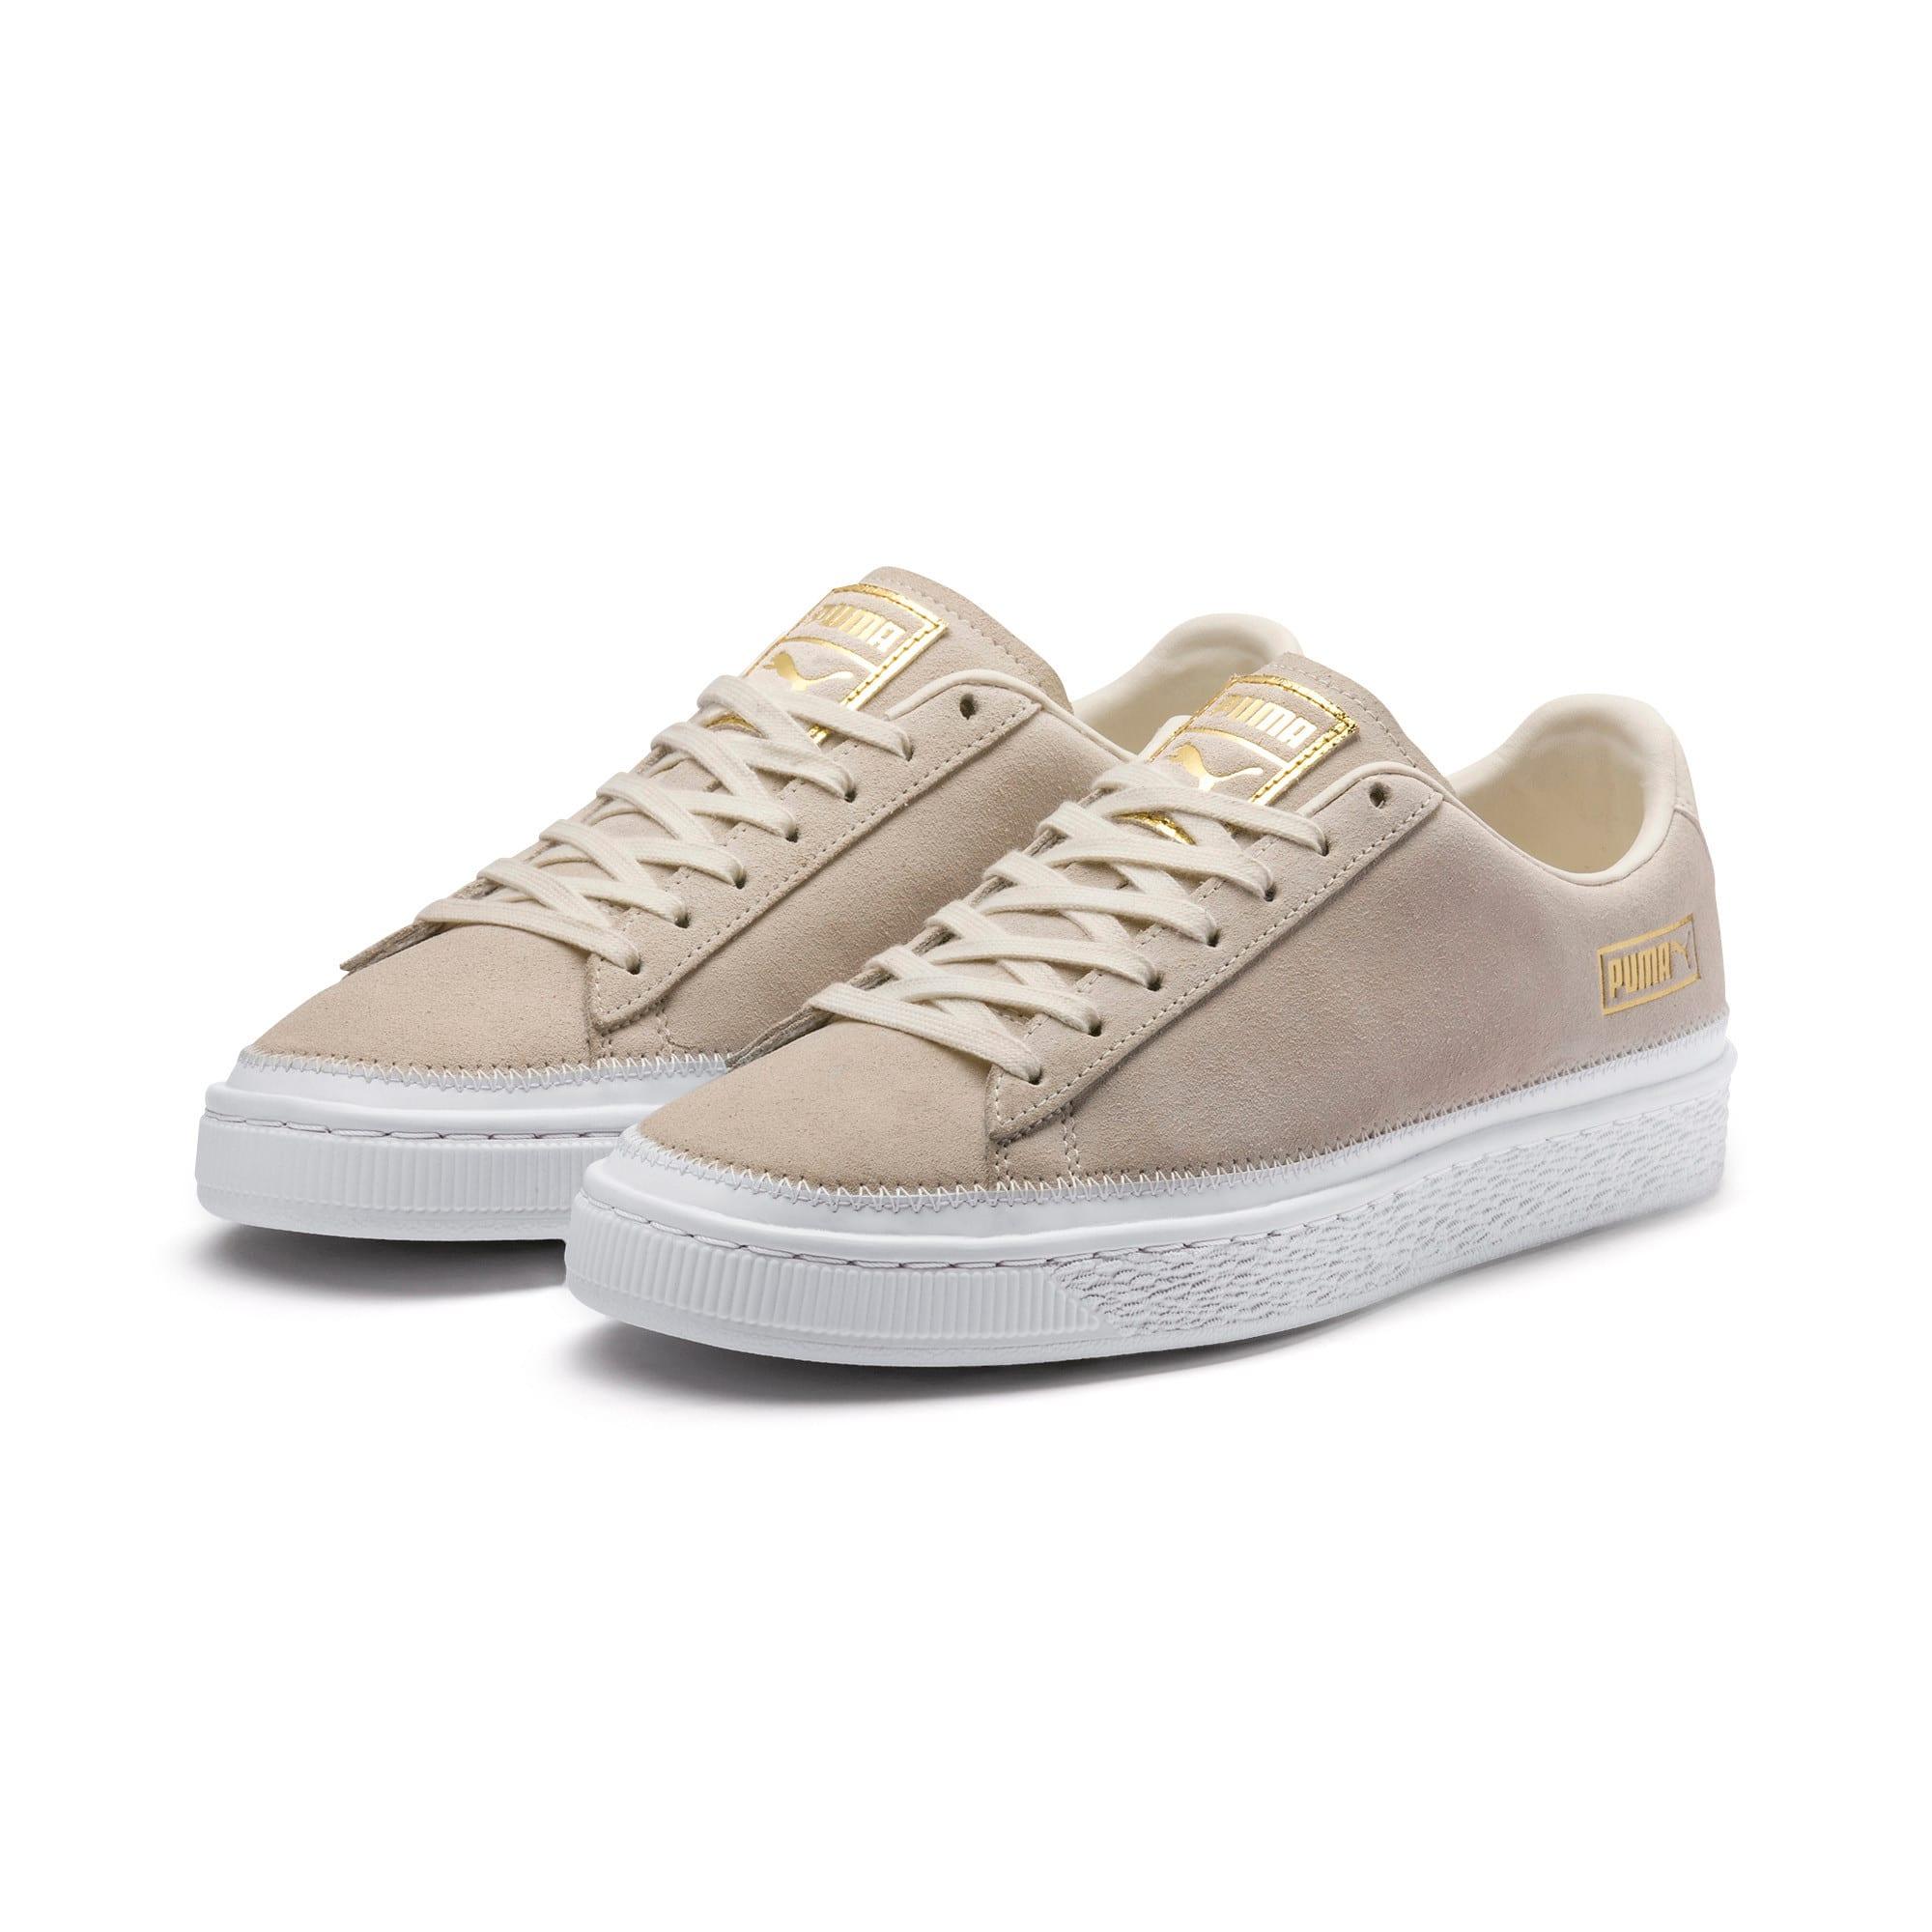 Thumbnail 3 of Suede Trim Sneaker, Whisper White-White- Gold, medium